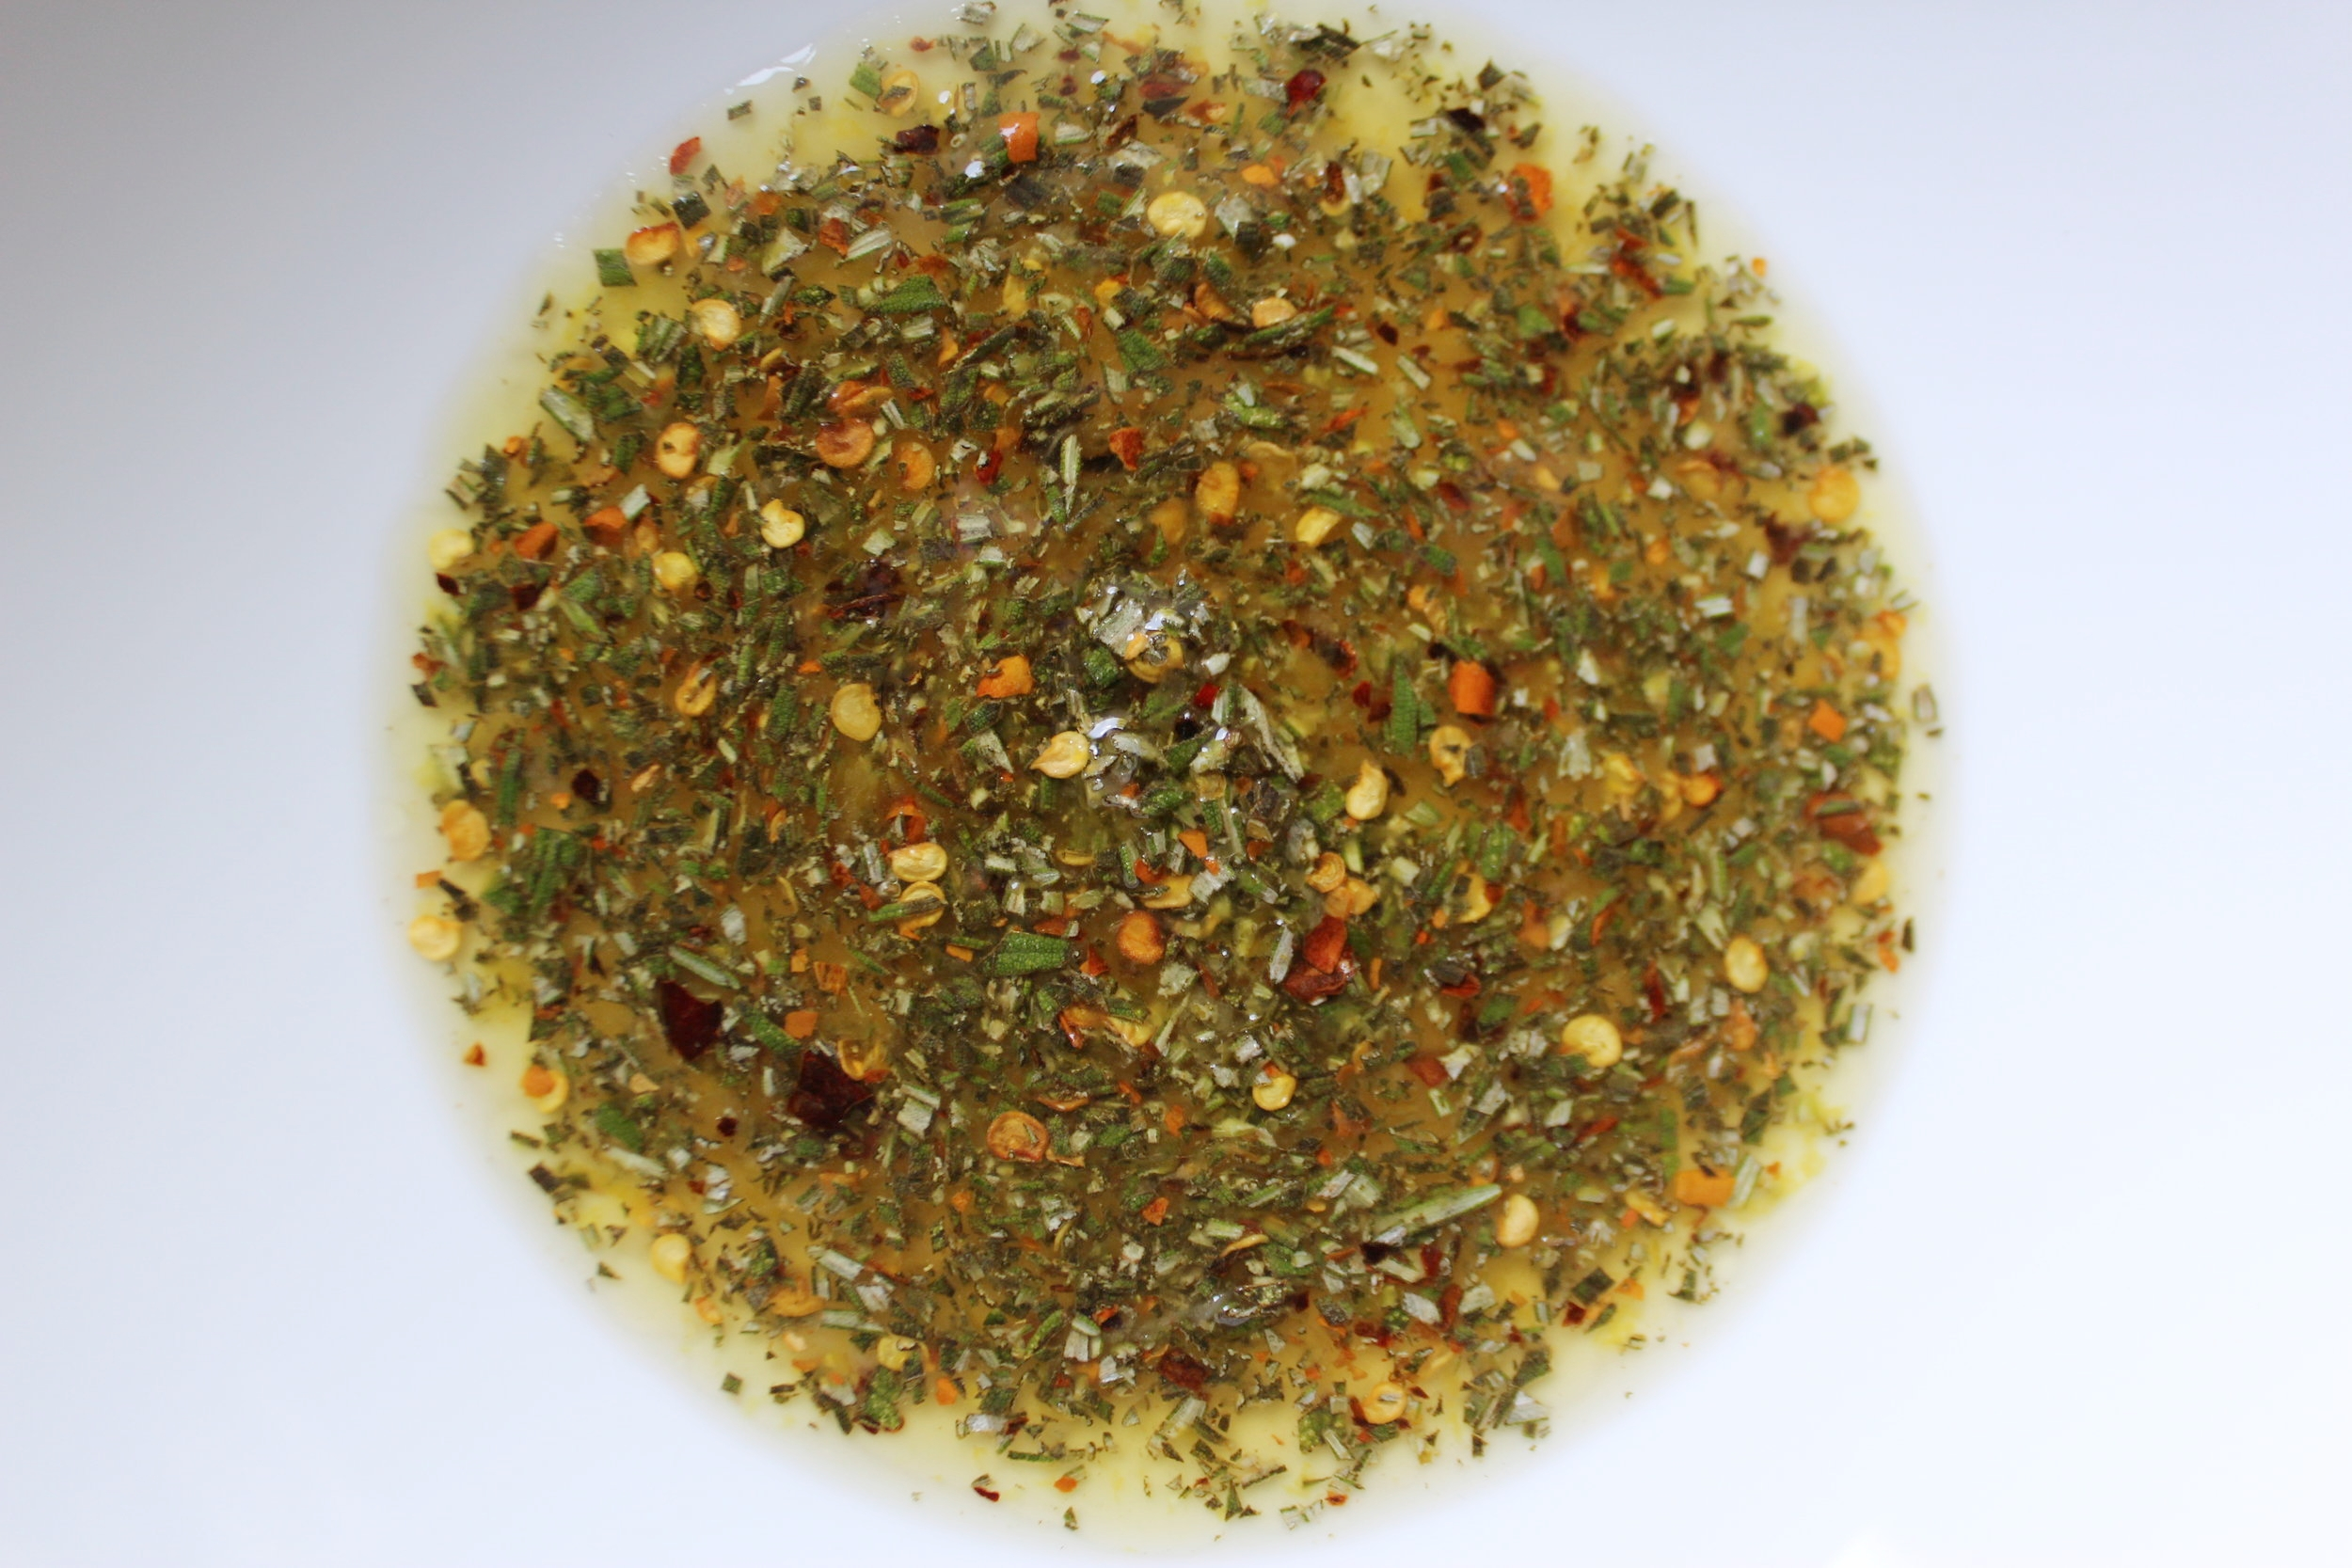 Rosemary-Chili Vinaigrette